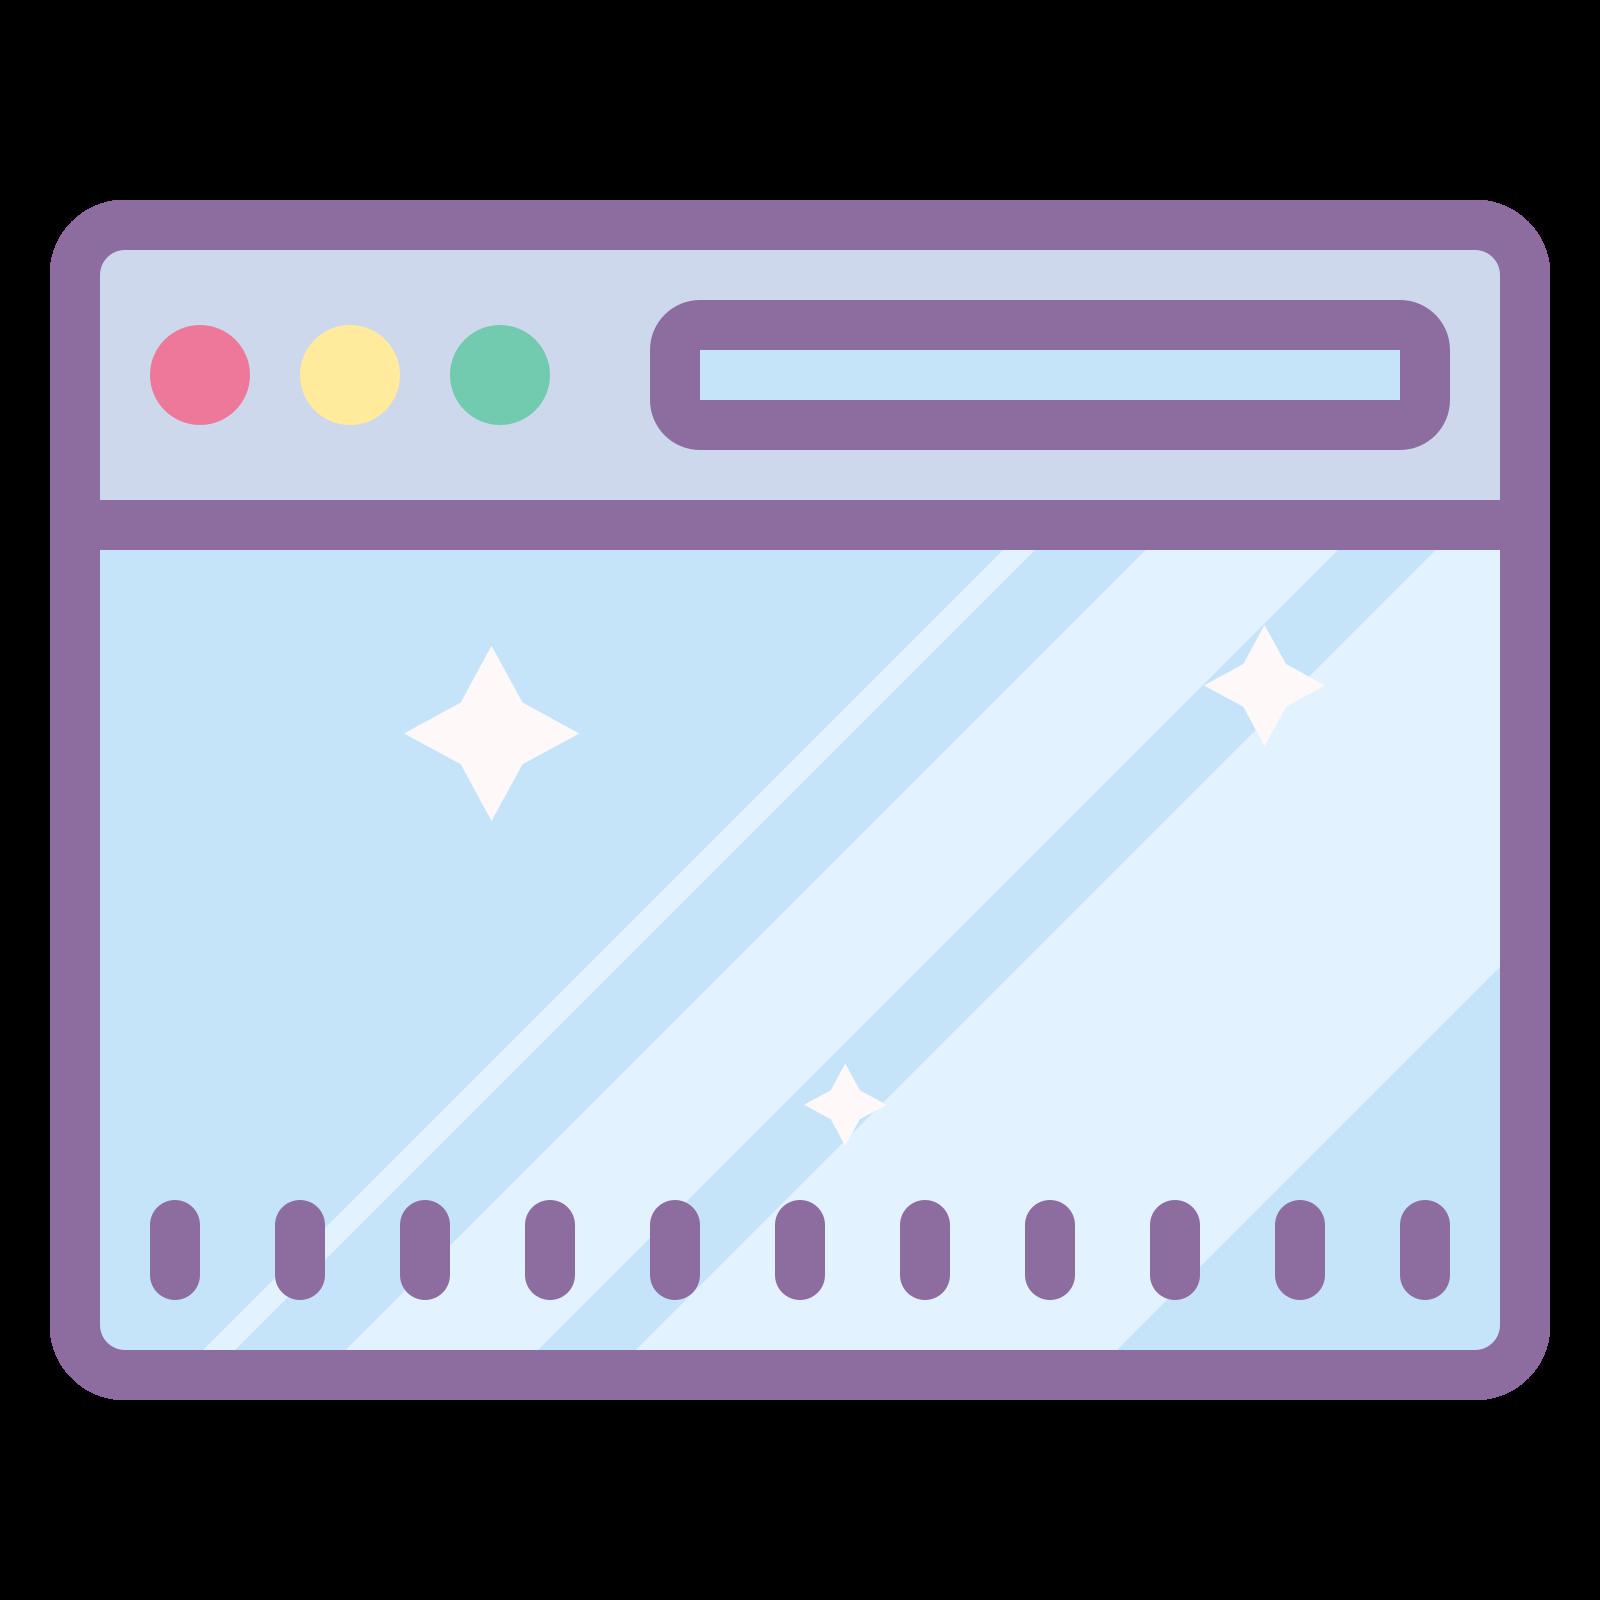 Okno przeglądarki icon